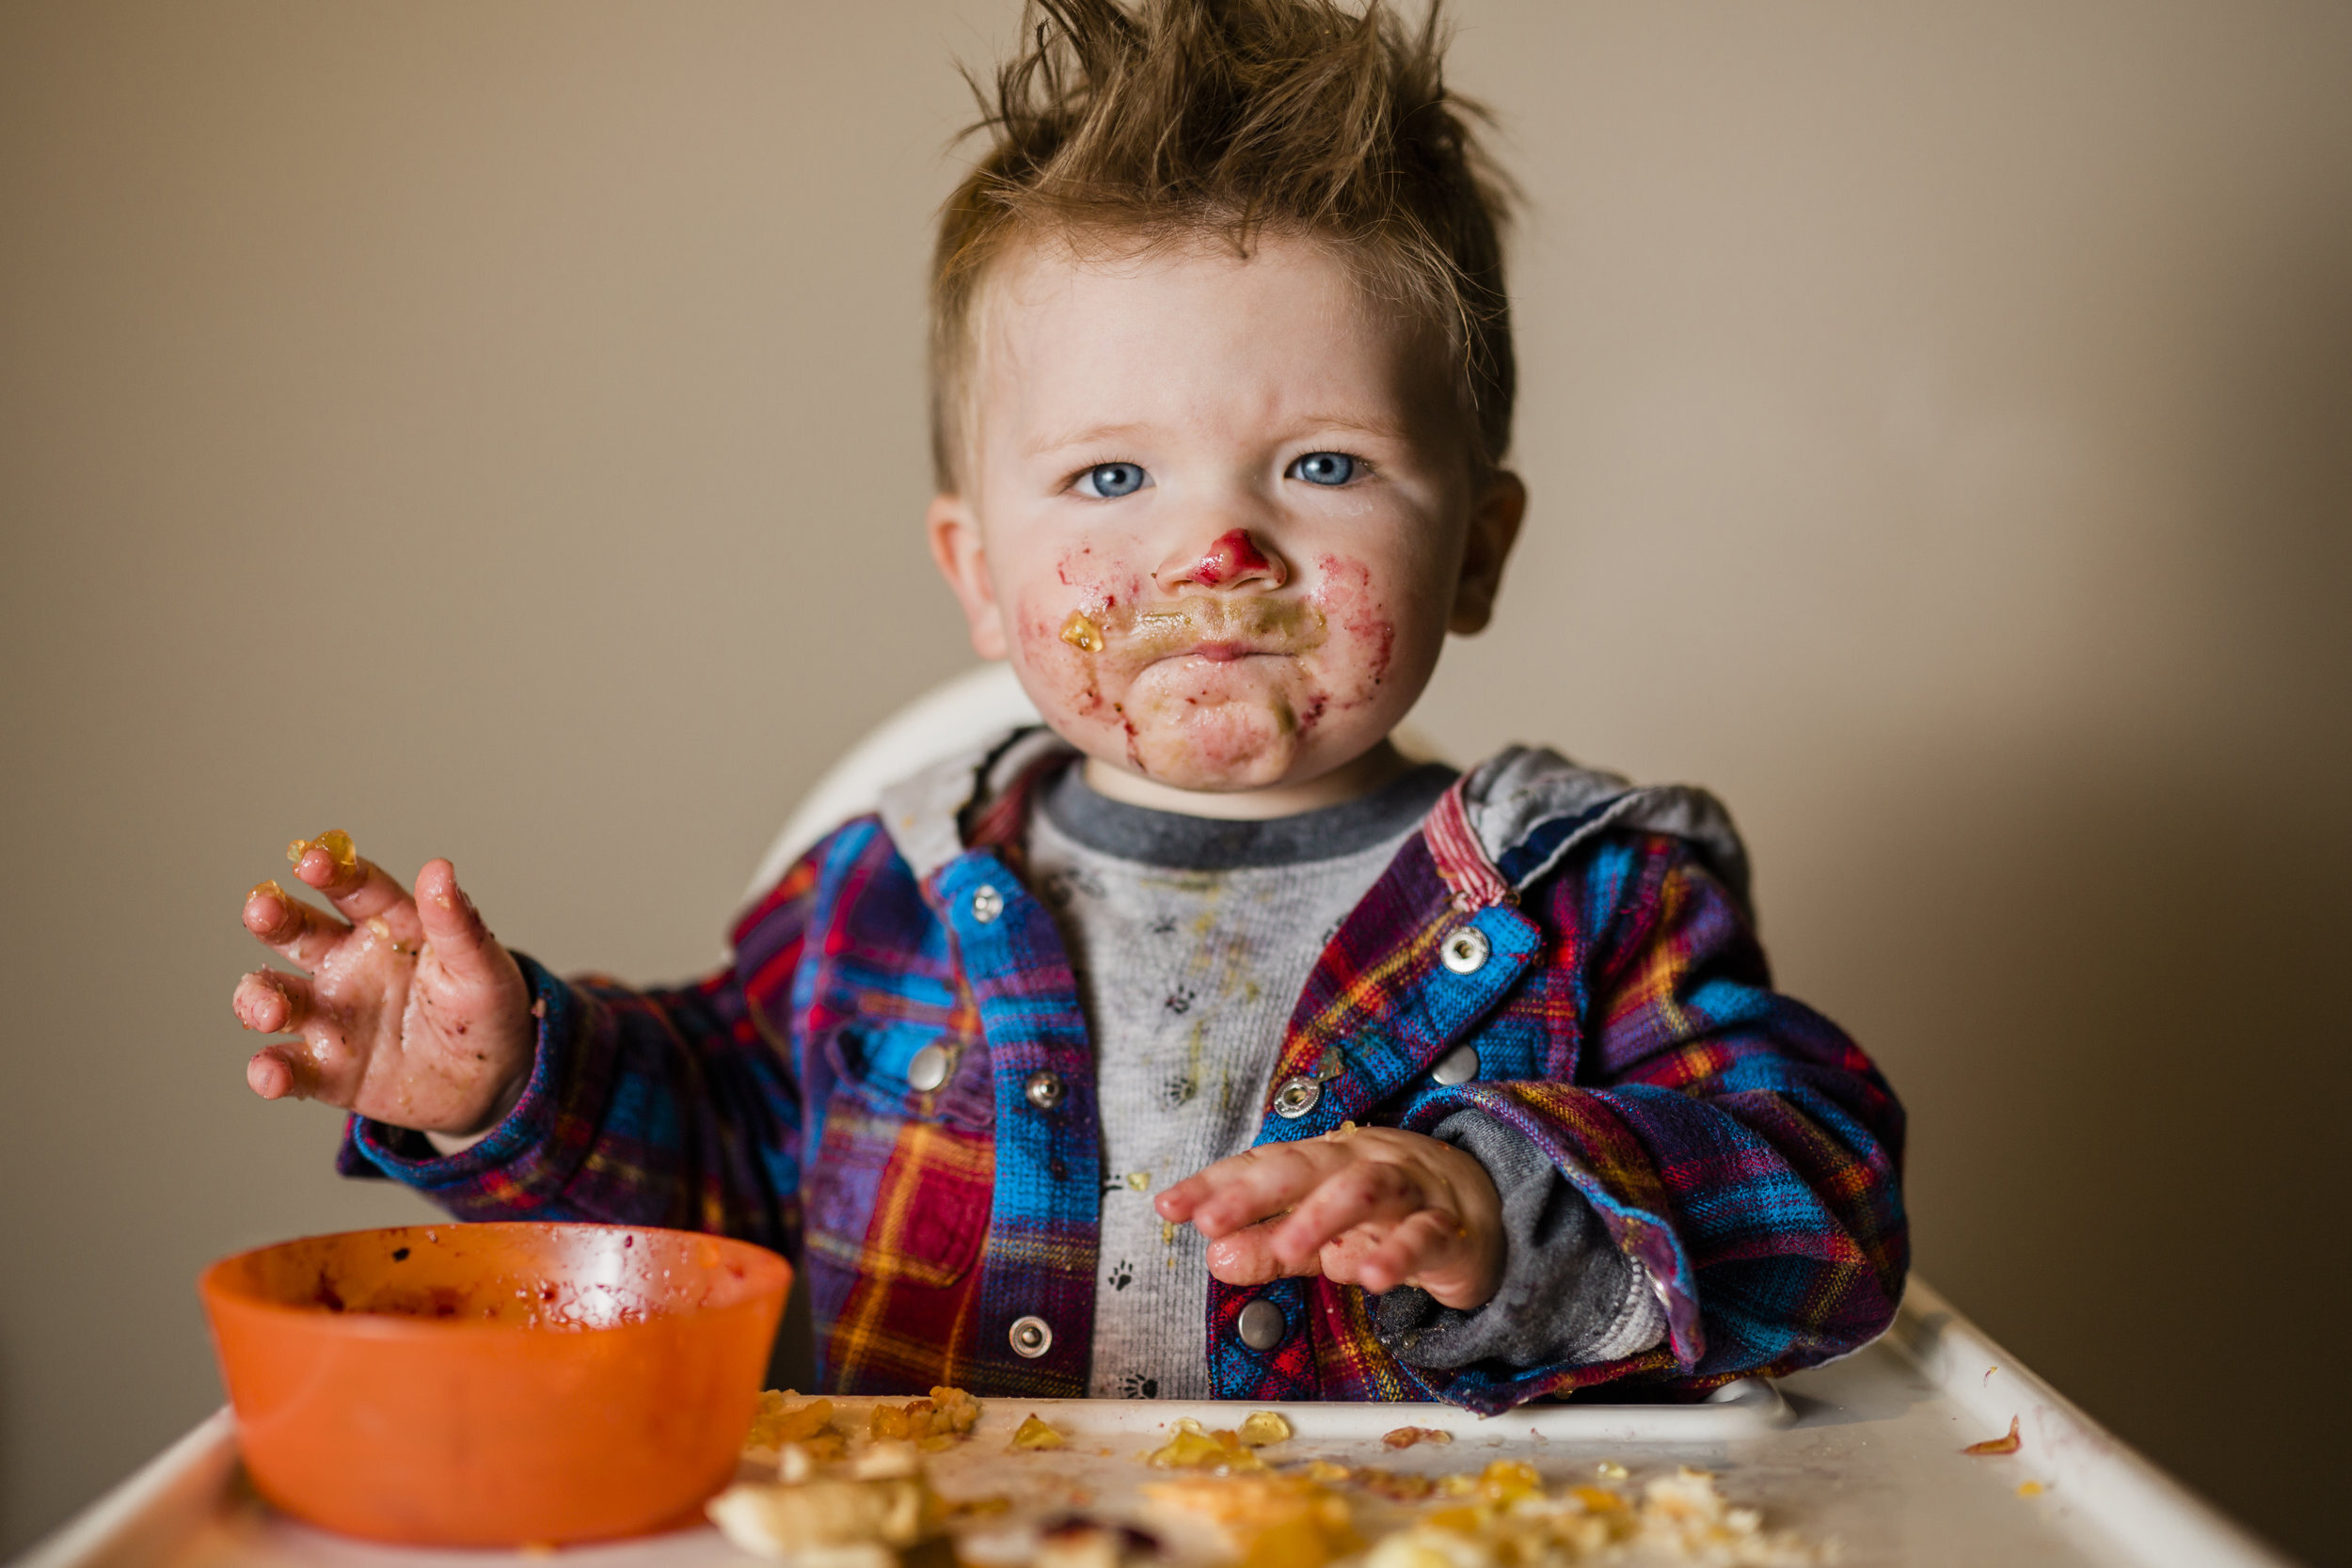 george eating.jpeg